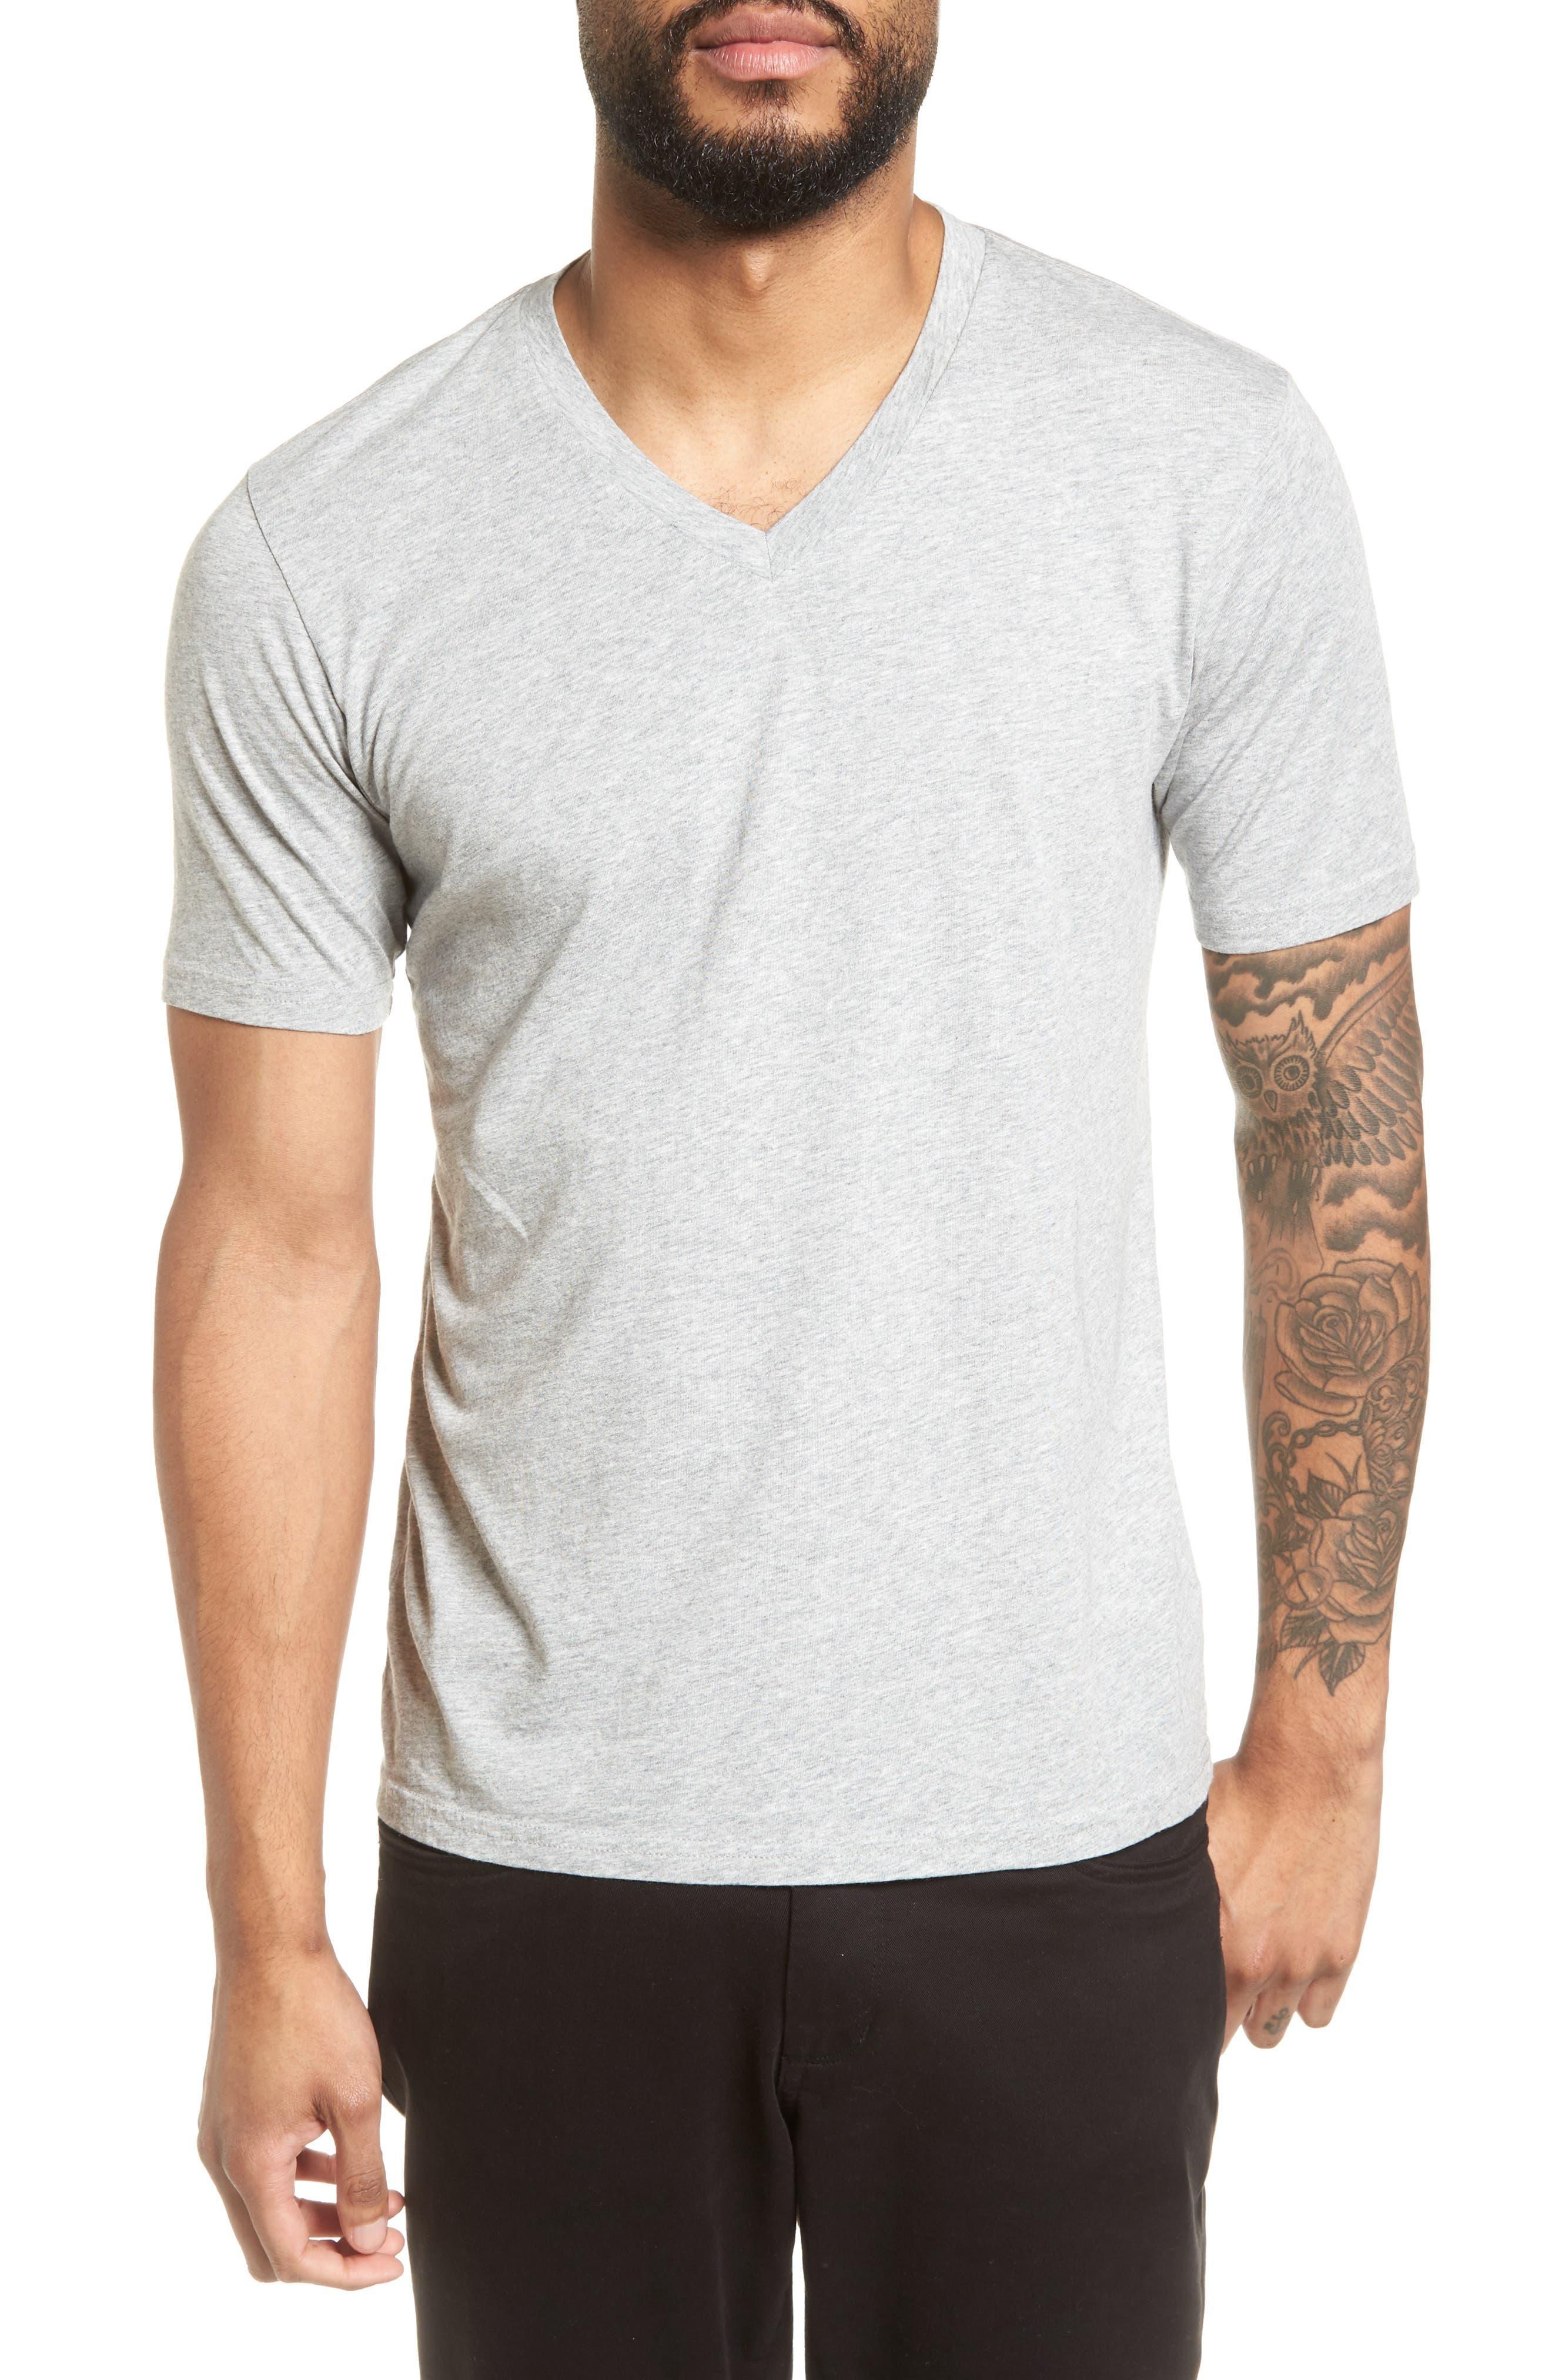 Goodlife Classic Supima Cotton Blend V-Neck T-Shirt